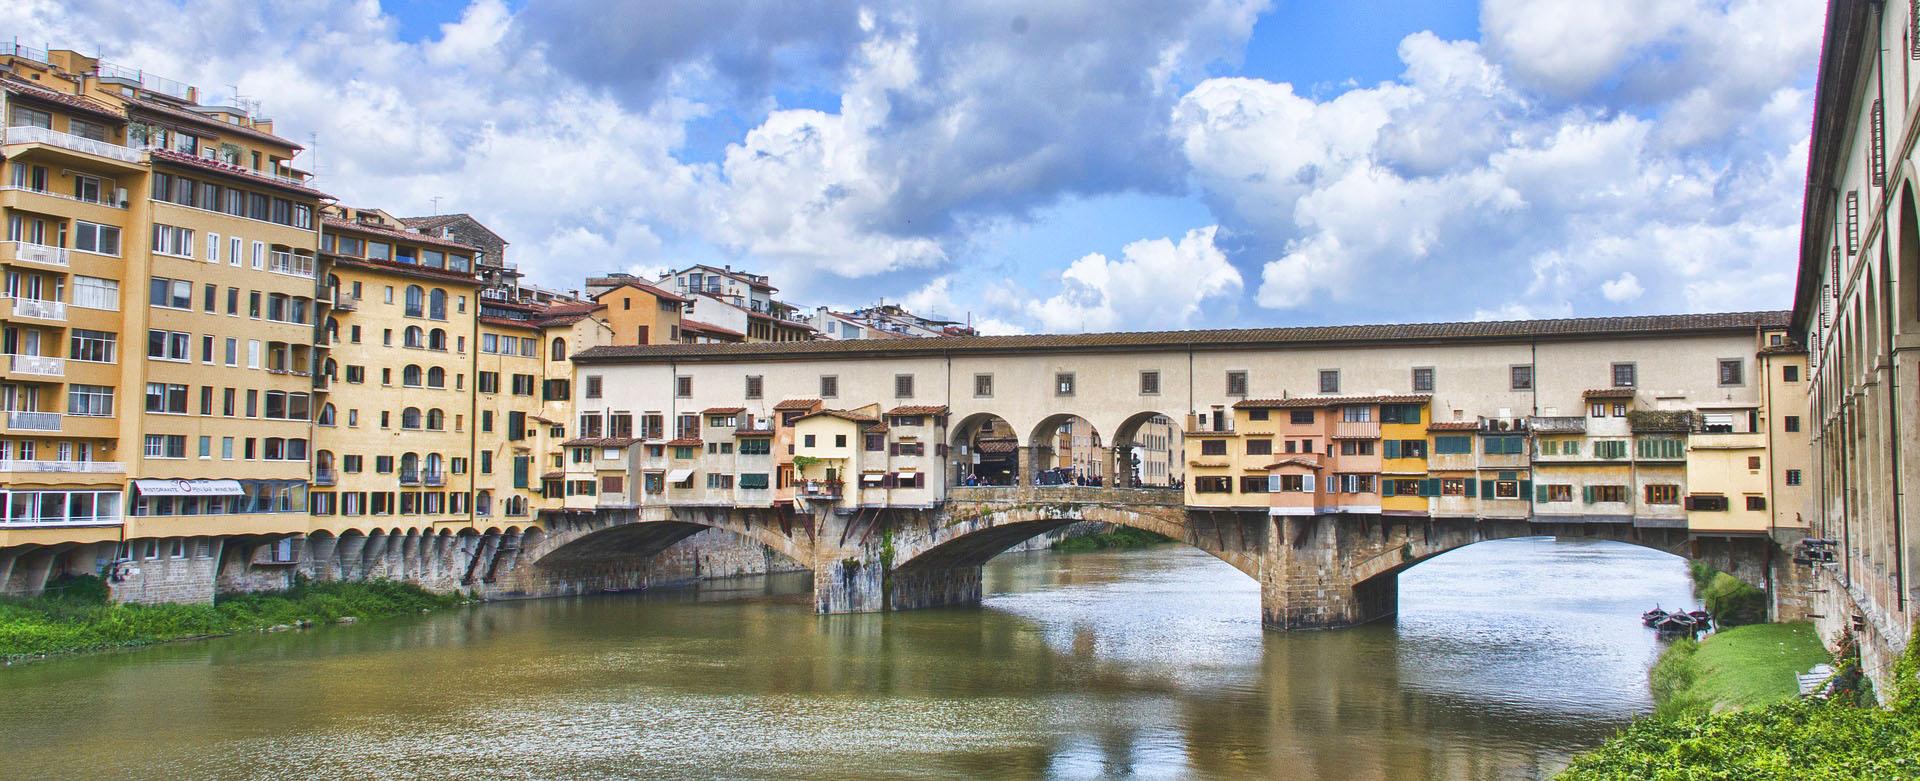 Toscana Italy Firenze Ponte Vecchio